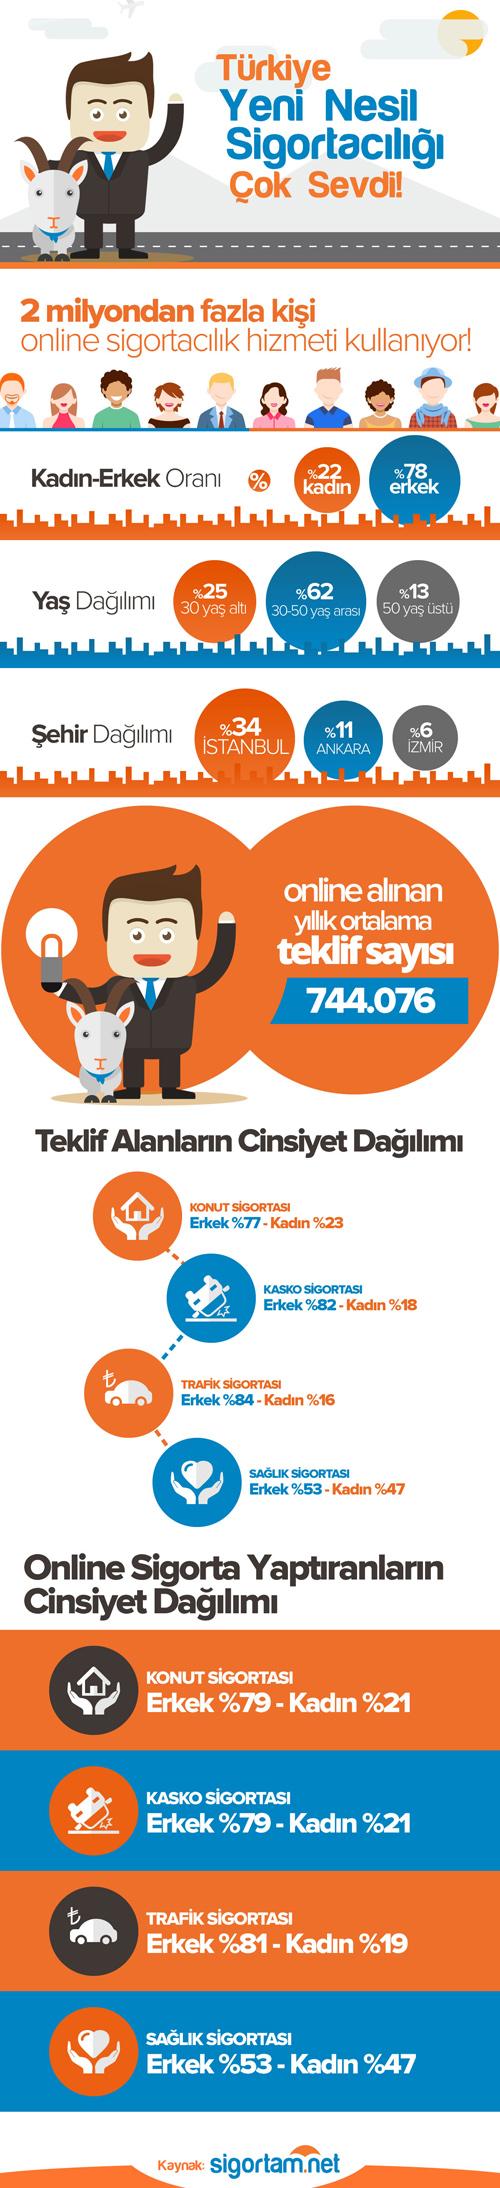 Sigortam.net_infografik_